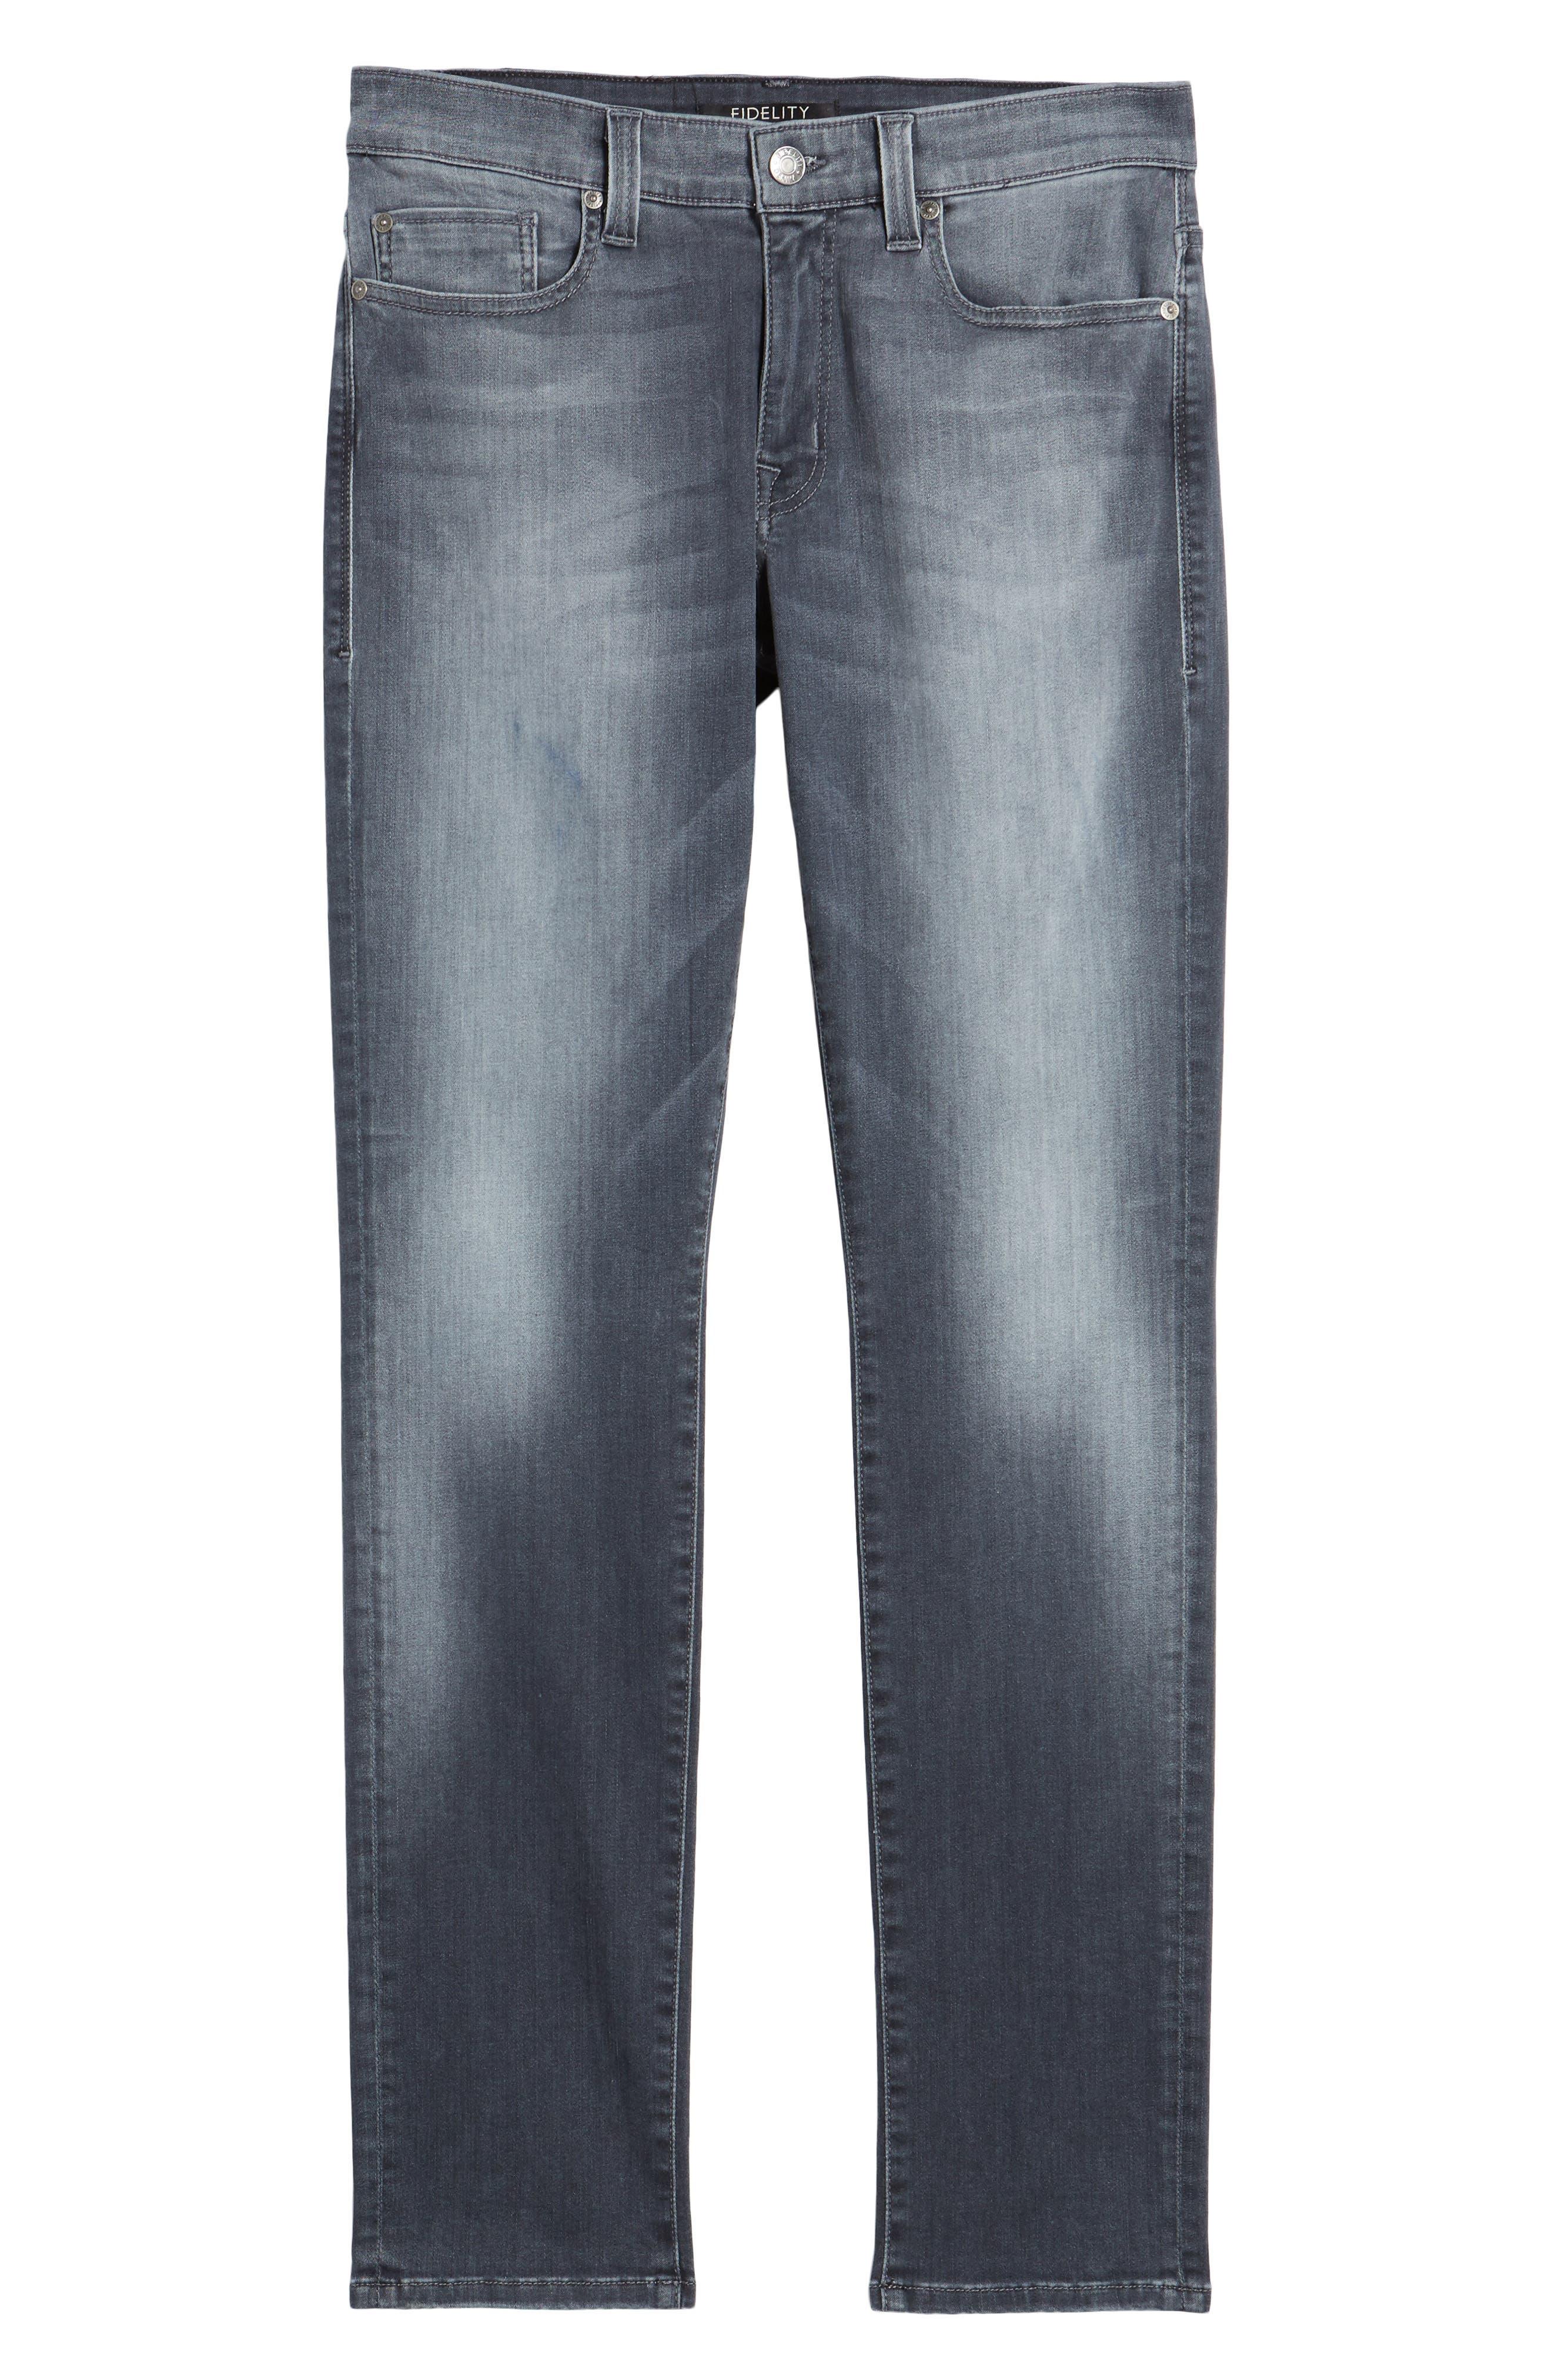 Torino Slim Fit Jeans,                             Alternate thumbnail 6, color,                             020